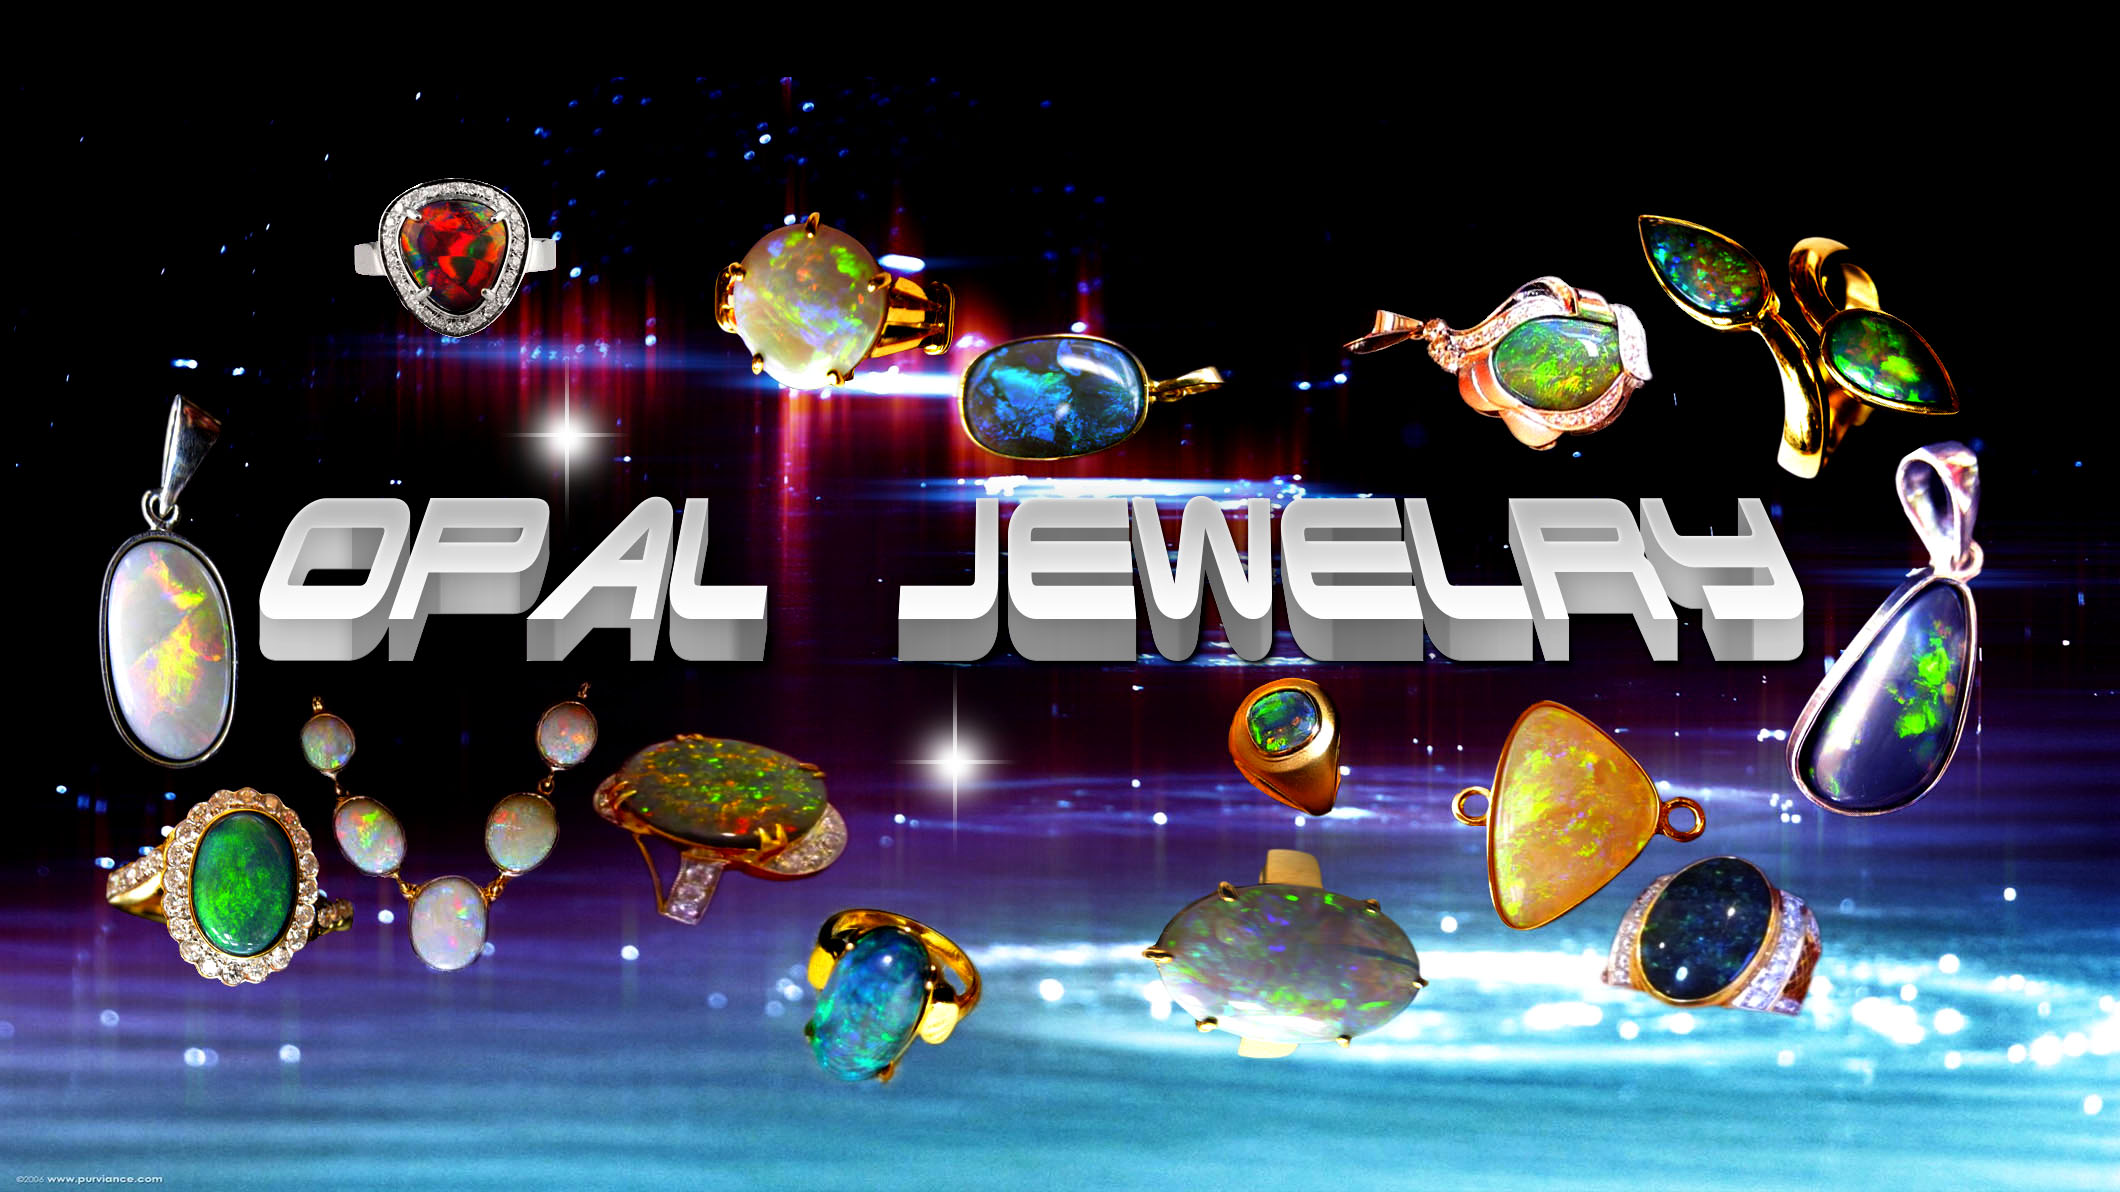 handmade opal rings,australian opal rings,black opal rings,handmade jewelry,black opal jewelry,australian opal jewelry,necklace online,opal necklace,handmade opal necklace